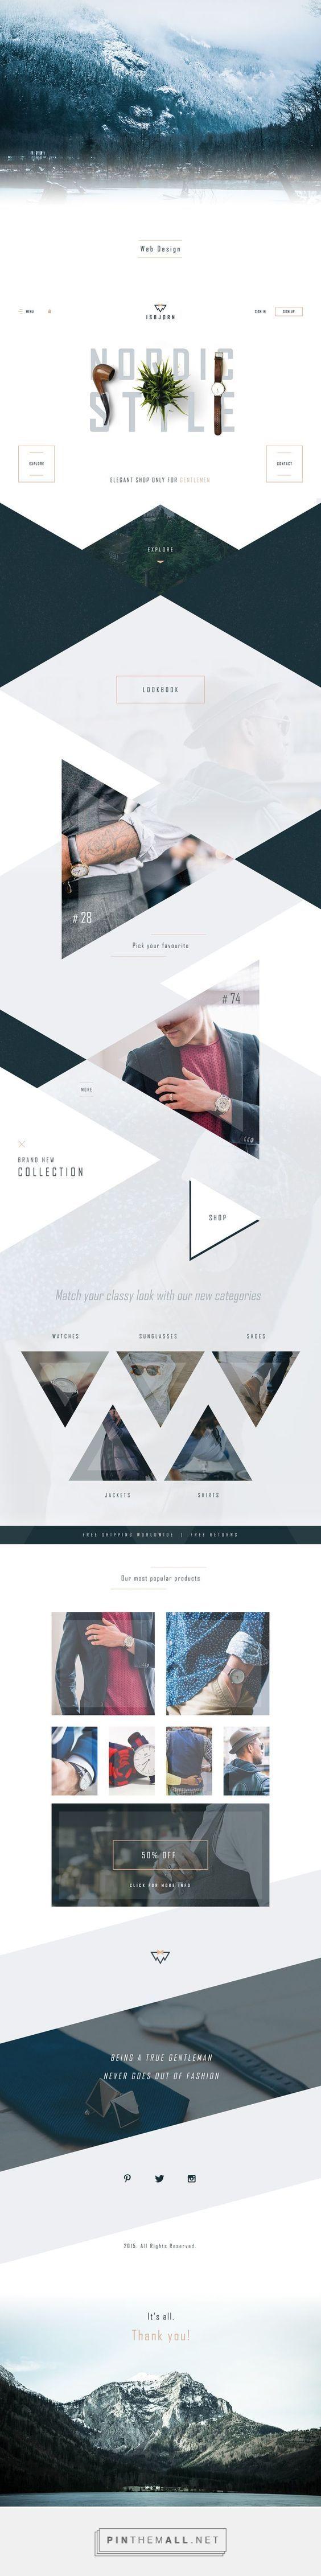 Fashion Web Design | Fivestar Branding – Design and Branding Agency & Inspiration Gallery